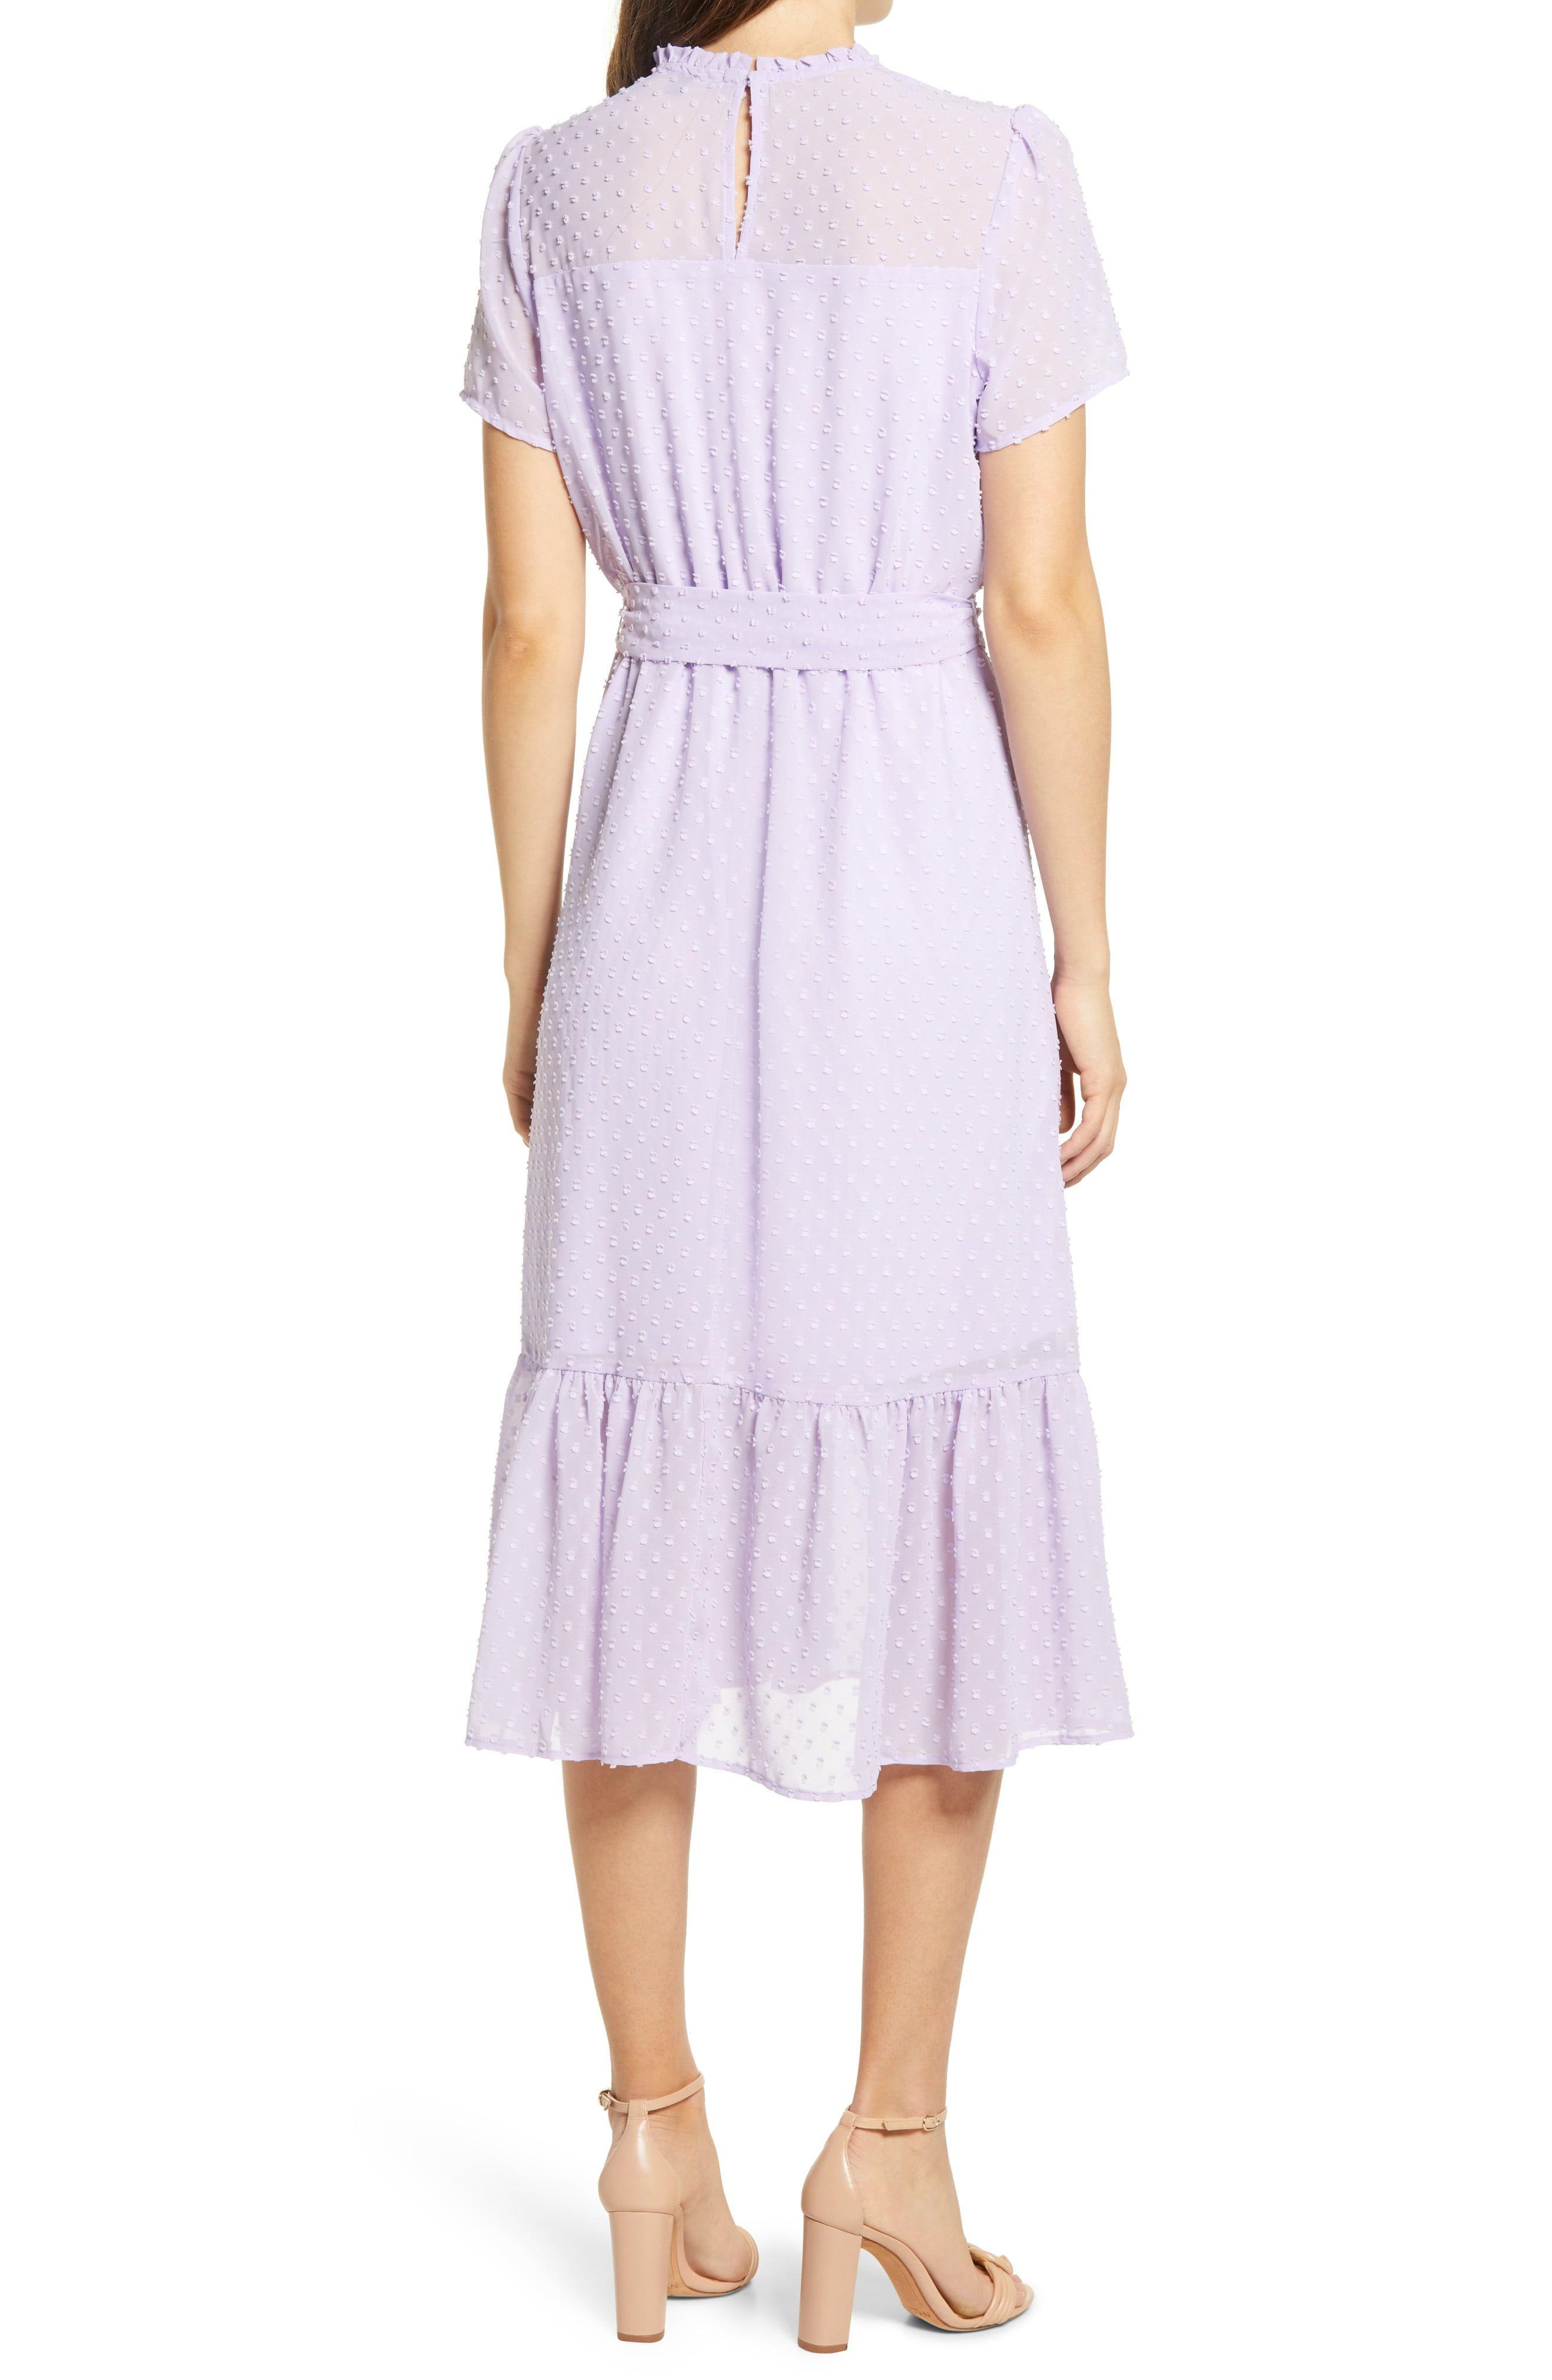 Gibsonlook Belted Swiss Dot Midi Dress Nordstrom In 2021 Clothes For Women Midi Dress Dresses [ 4048 x 2640 Pixel ]